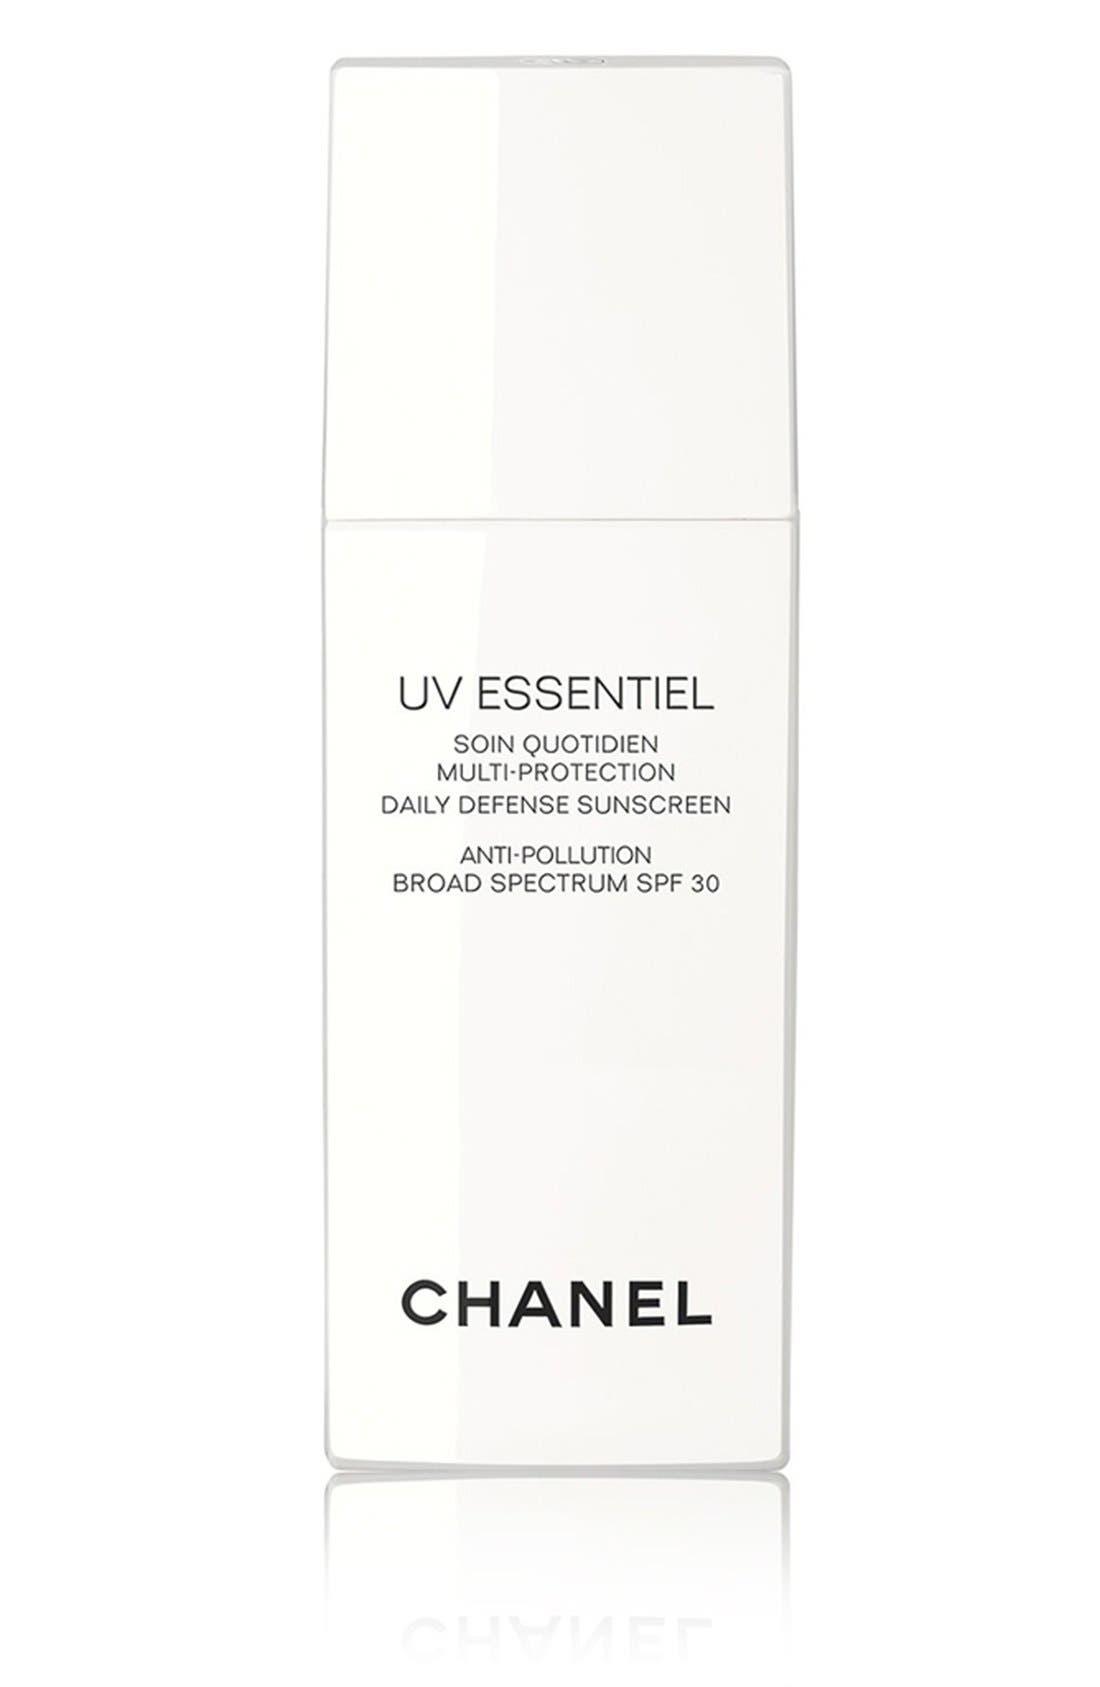 UV ESSENTIEL<br />Multi-Protection Daily Defense Sunscreen Anti-Pollution Broad Spectrum SPF 30,                             Main thumbnail 1, color,                             000